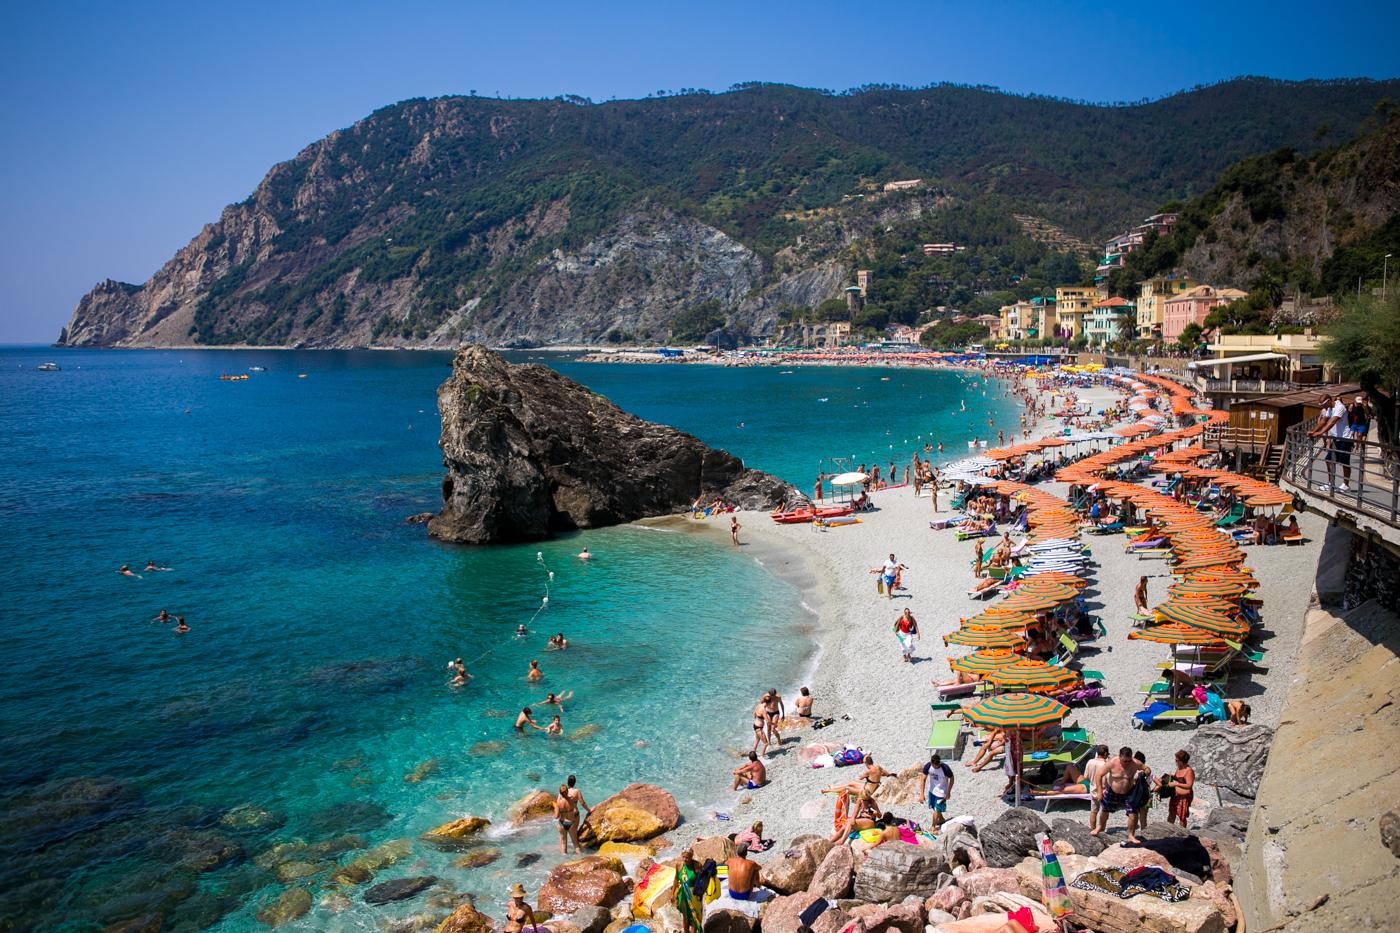 Agriturismo Ca Du Ferra Vicino Alle Cinque Terre In Liguria Contattaci